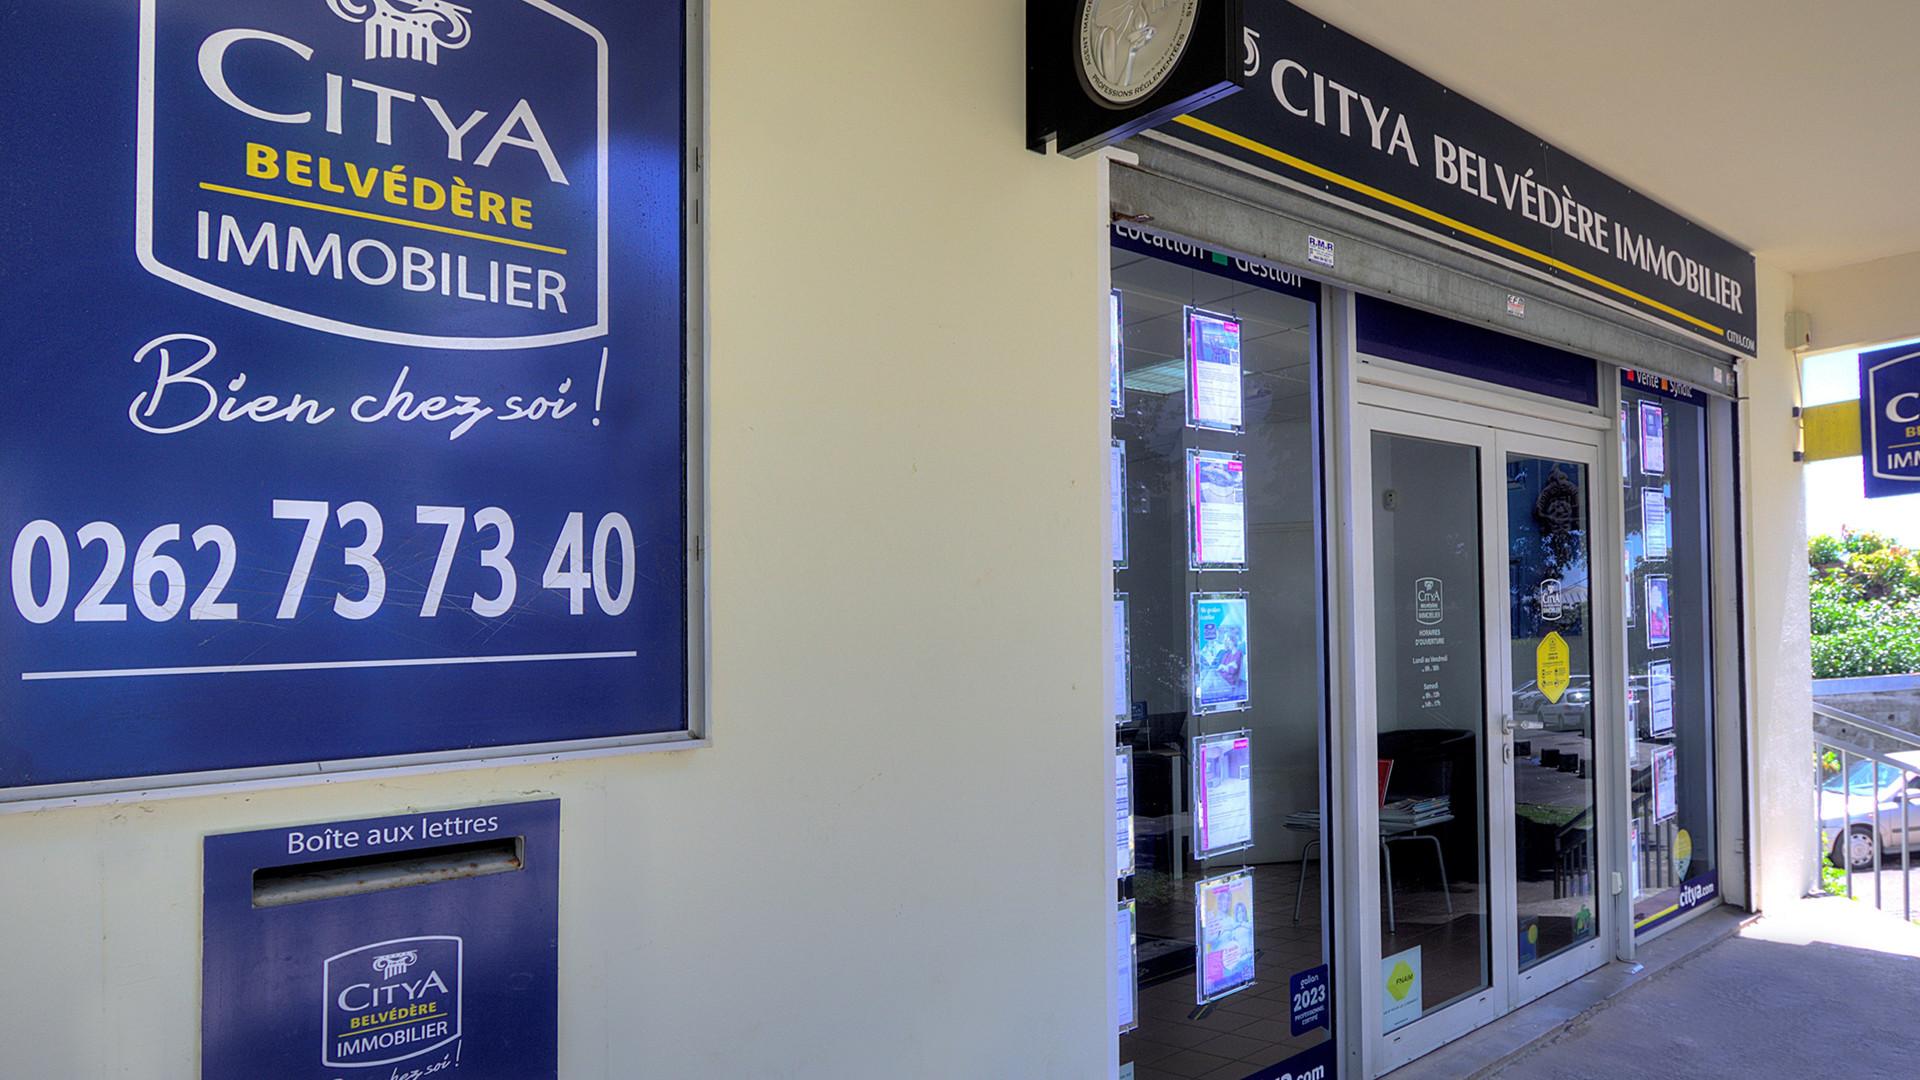 Agence immo Citya Belvédère